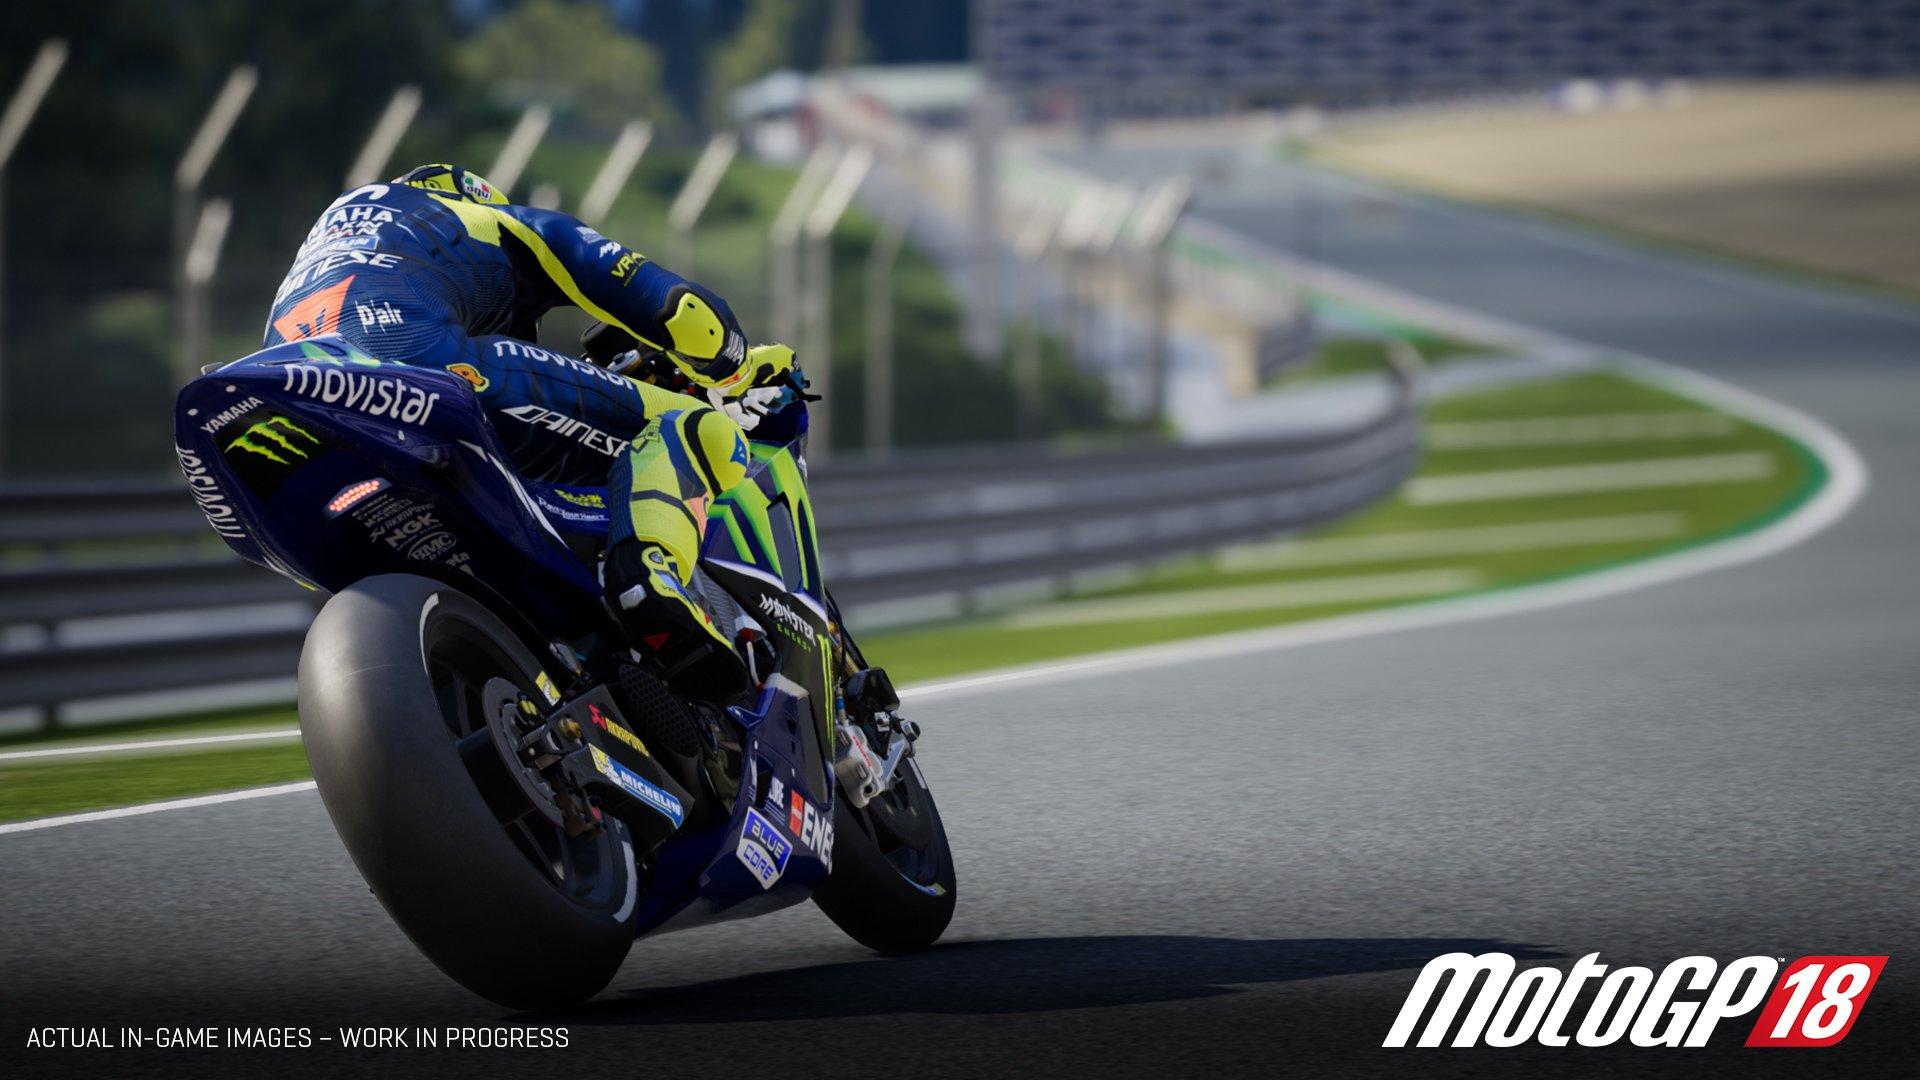 MotoGP 18 preview 8